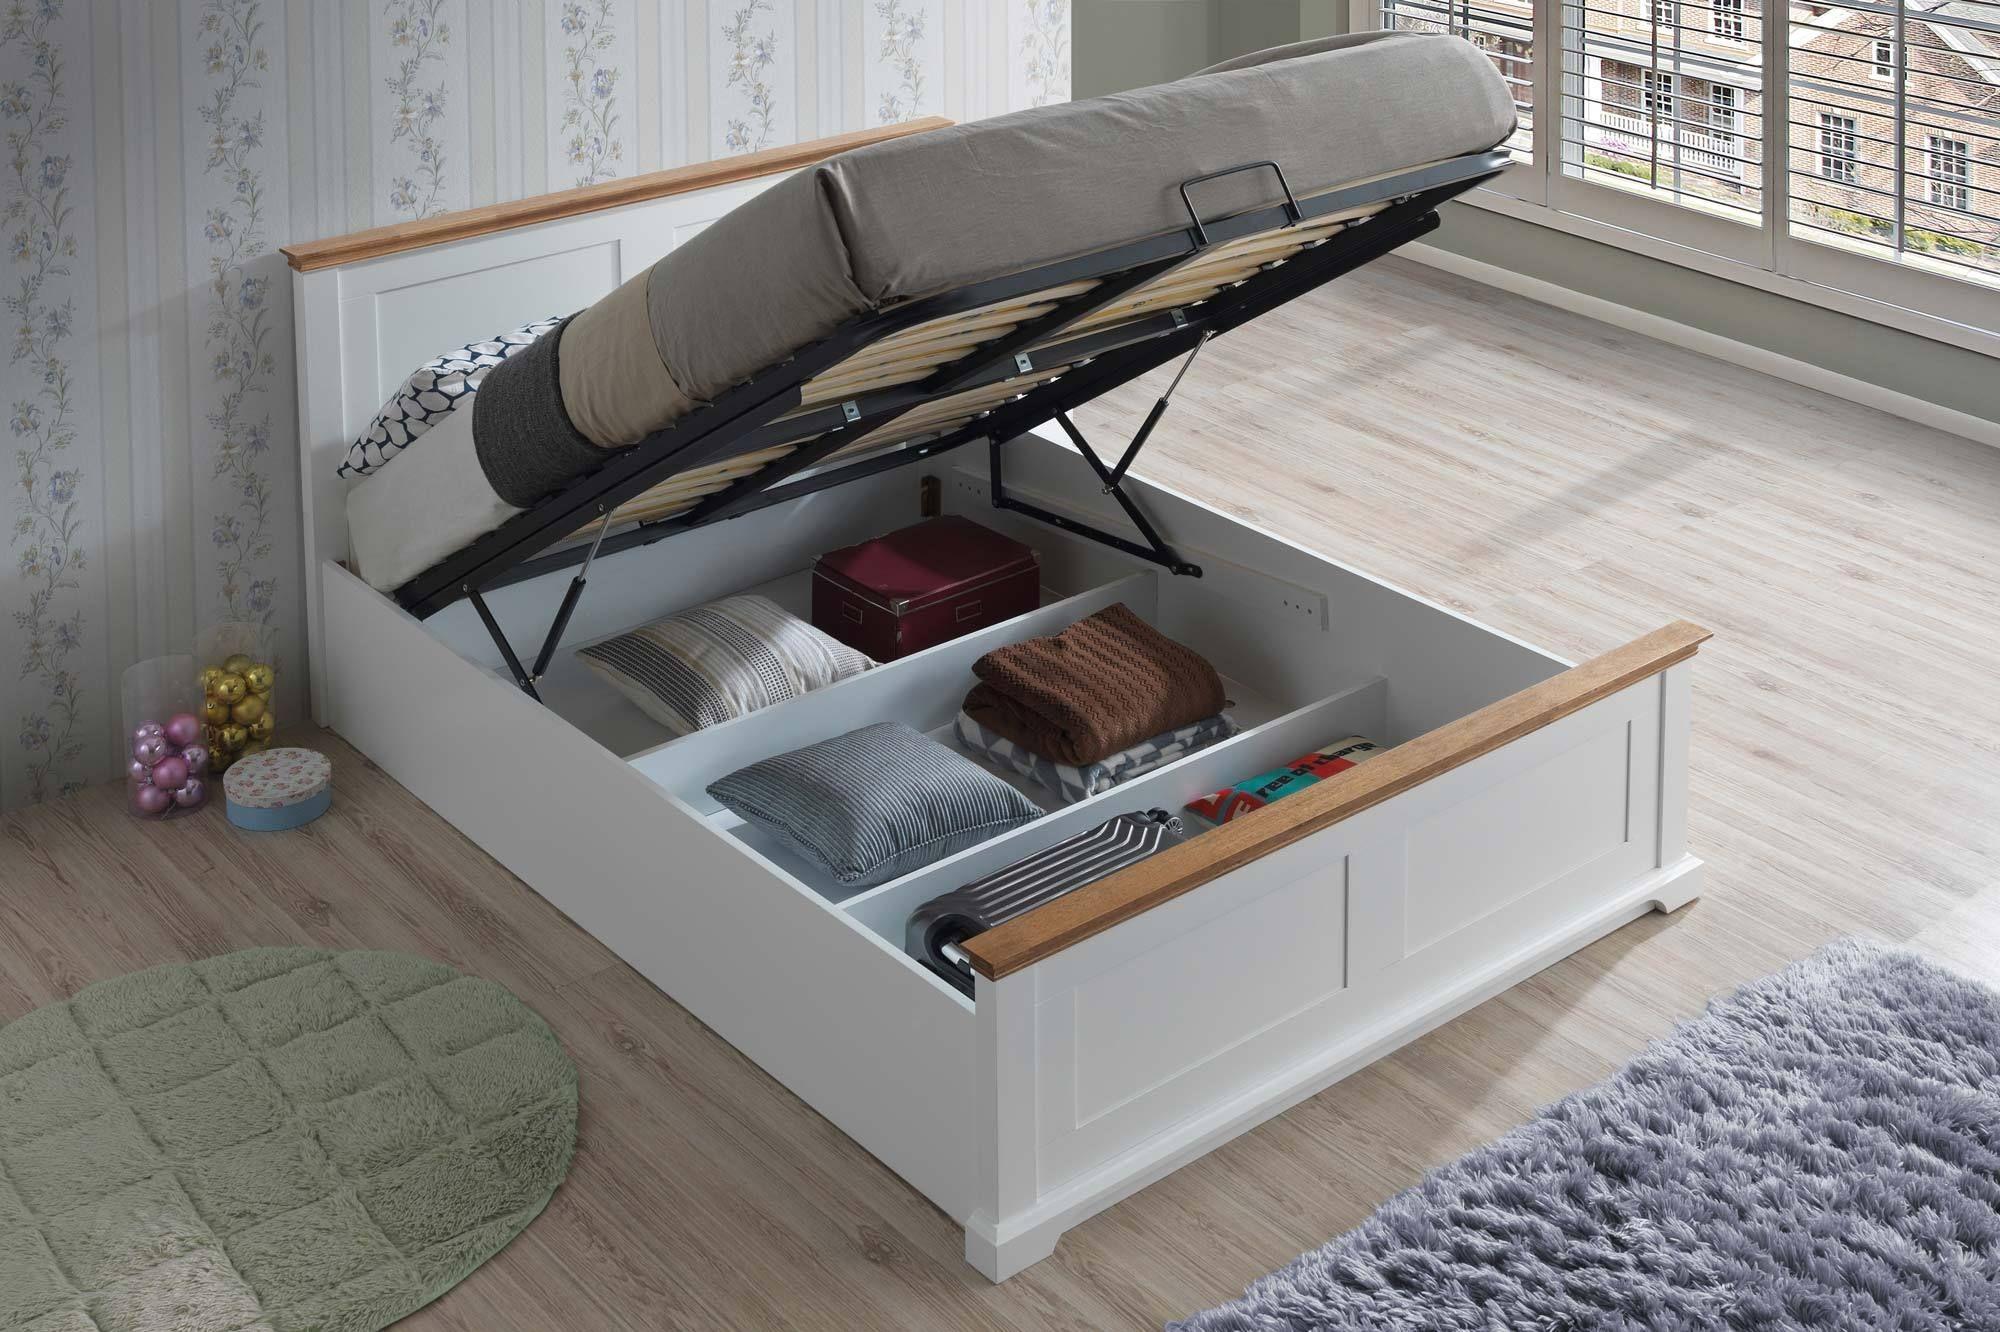 Terrific Chilgrove White Oak Ottoman Storage Bed Frame 5Ft King Dailytribune Chair Design For Home Dailytribuneorg